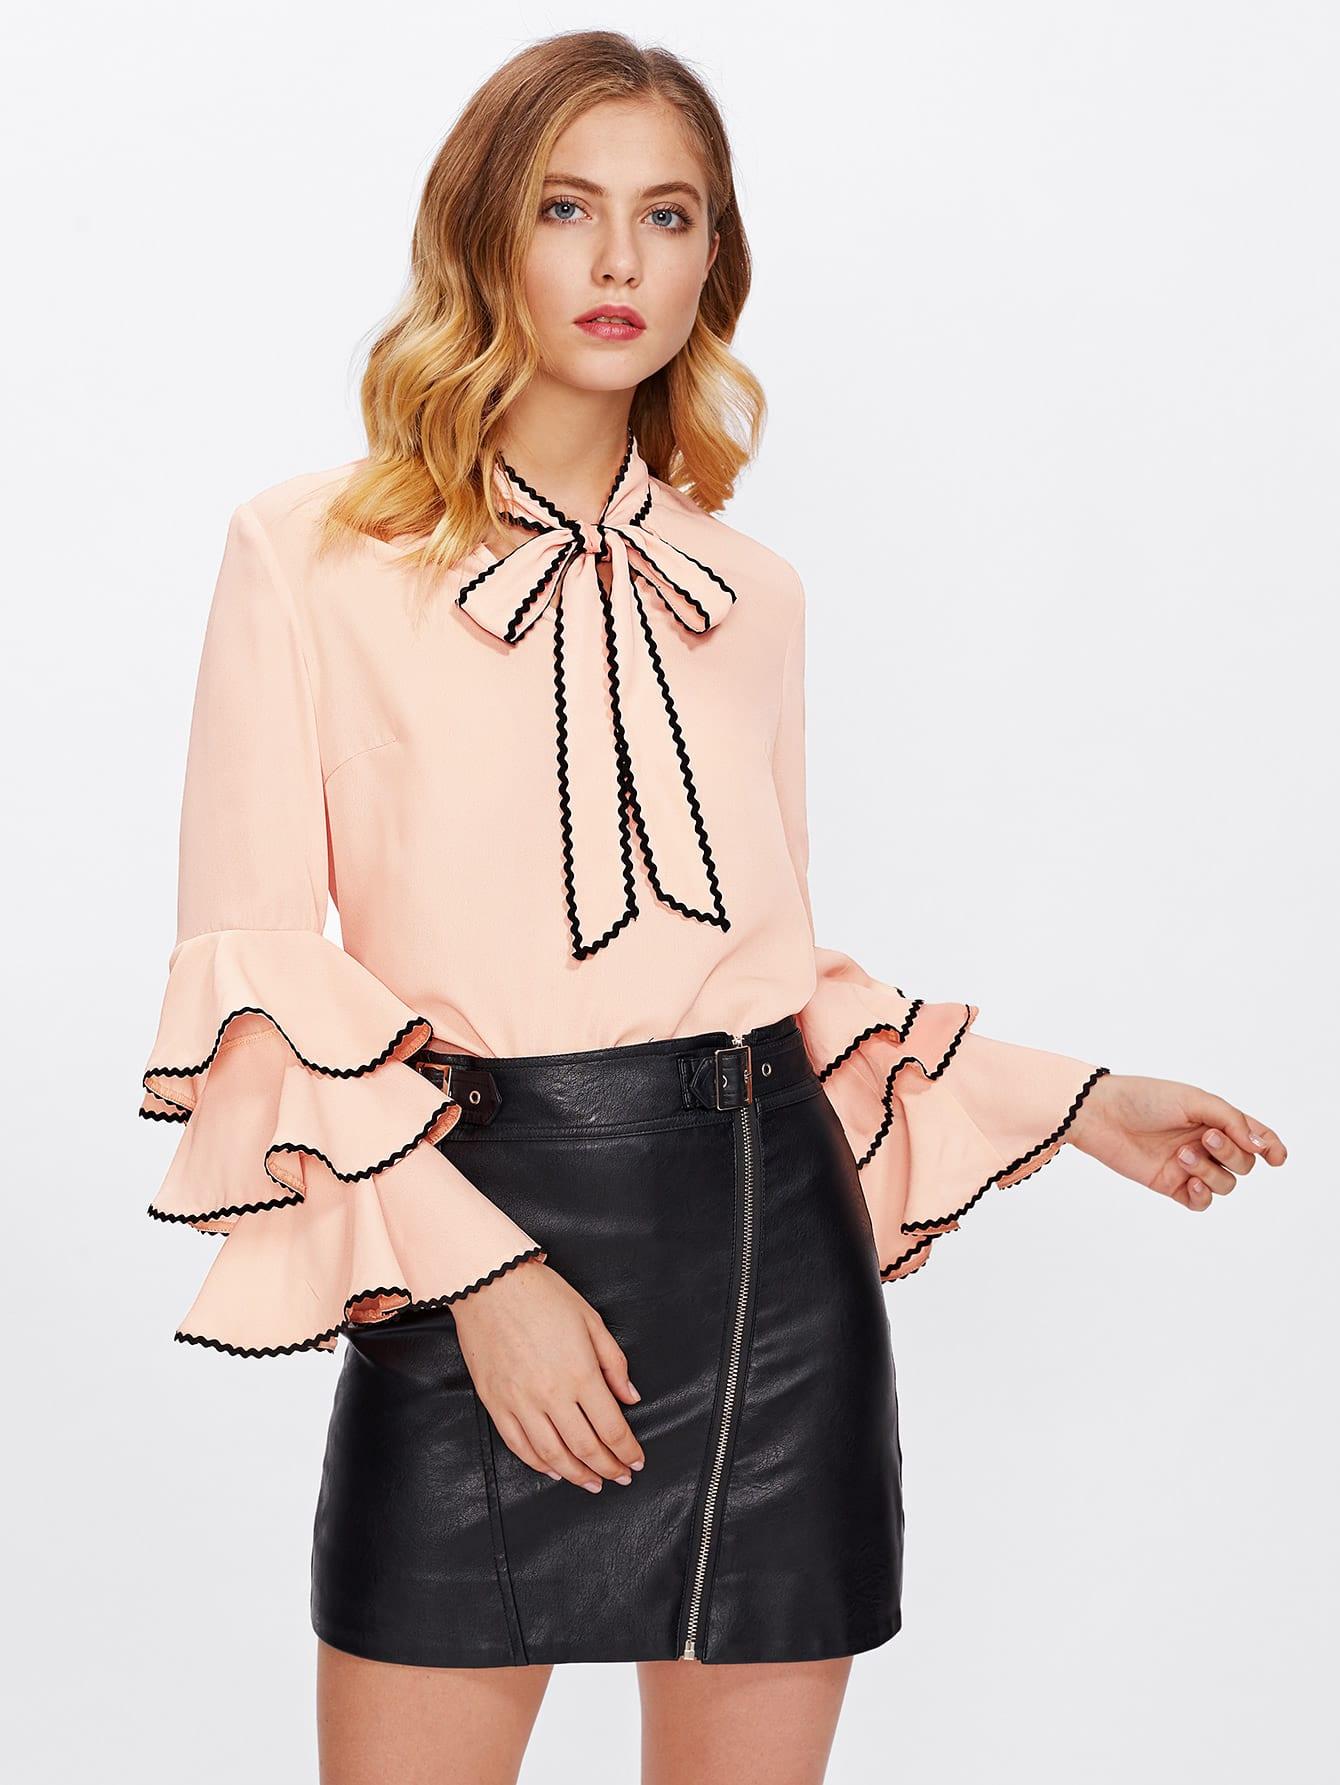 Bow Neck Wave Lace Trim Layered Sleeve Blouse v neck lace trim velvet blouse